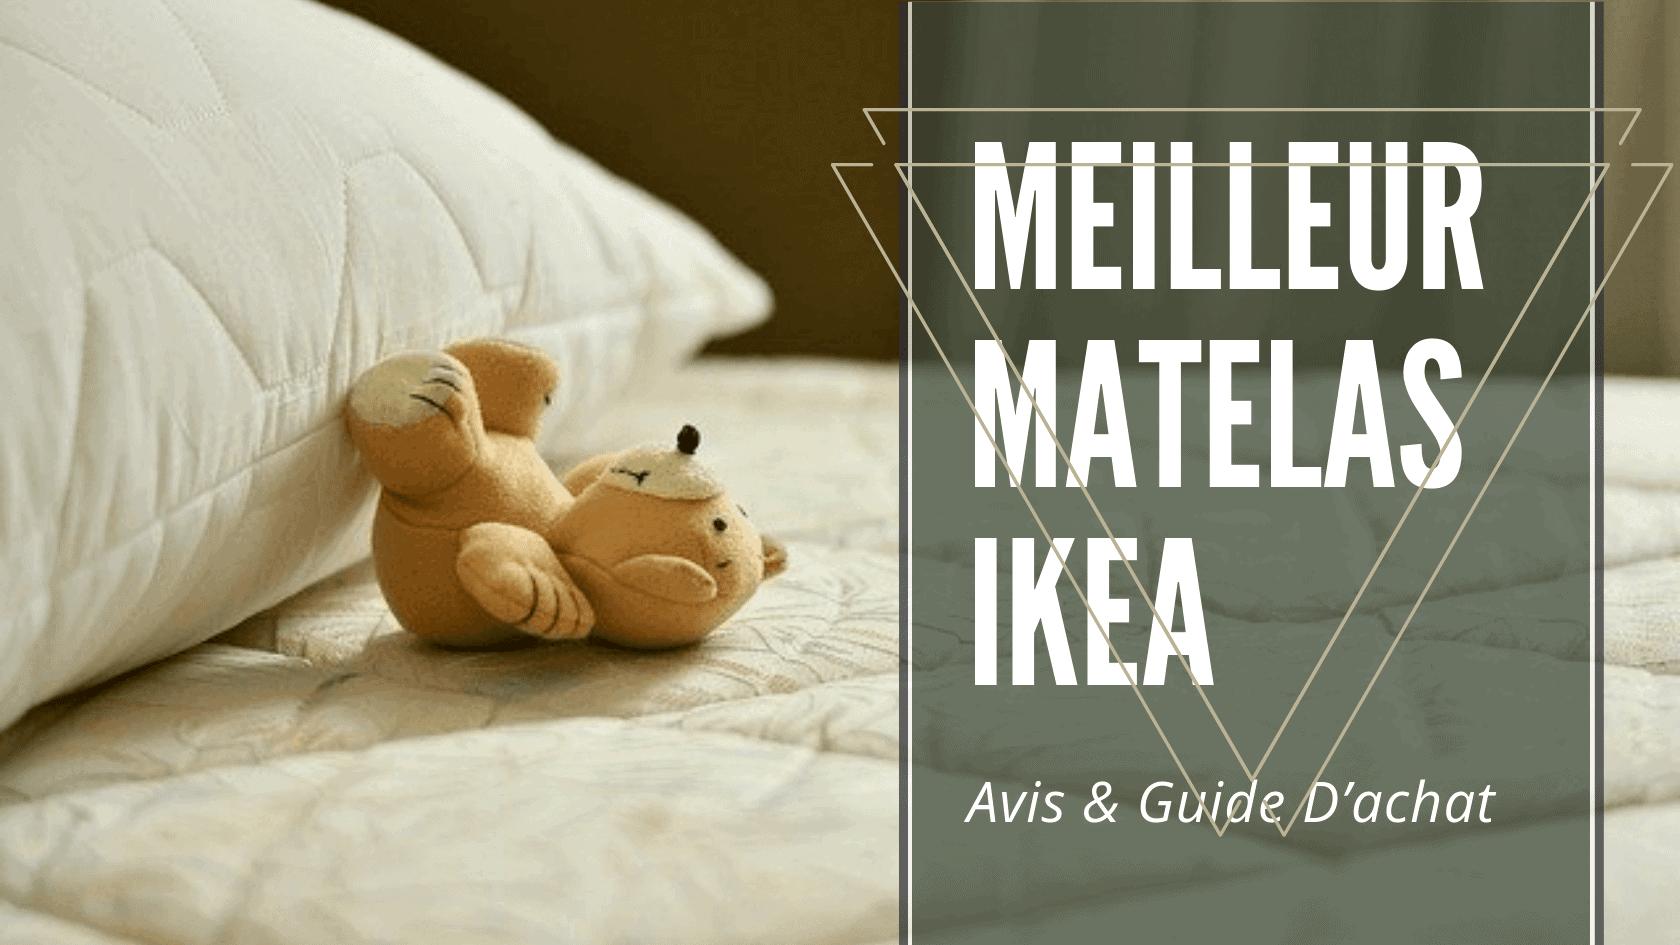 Meilleur Matelas Ikea